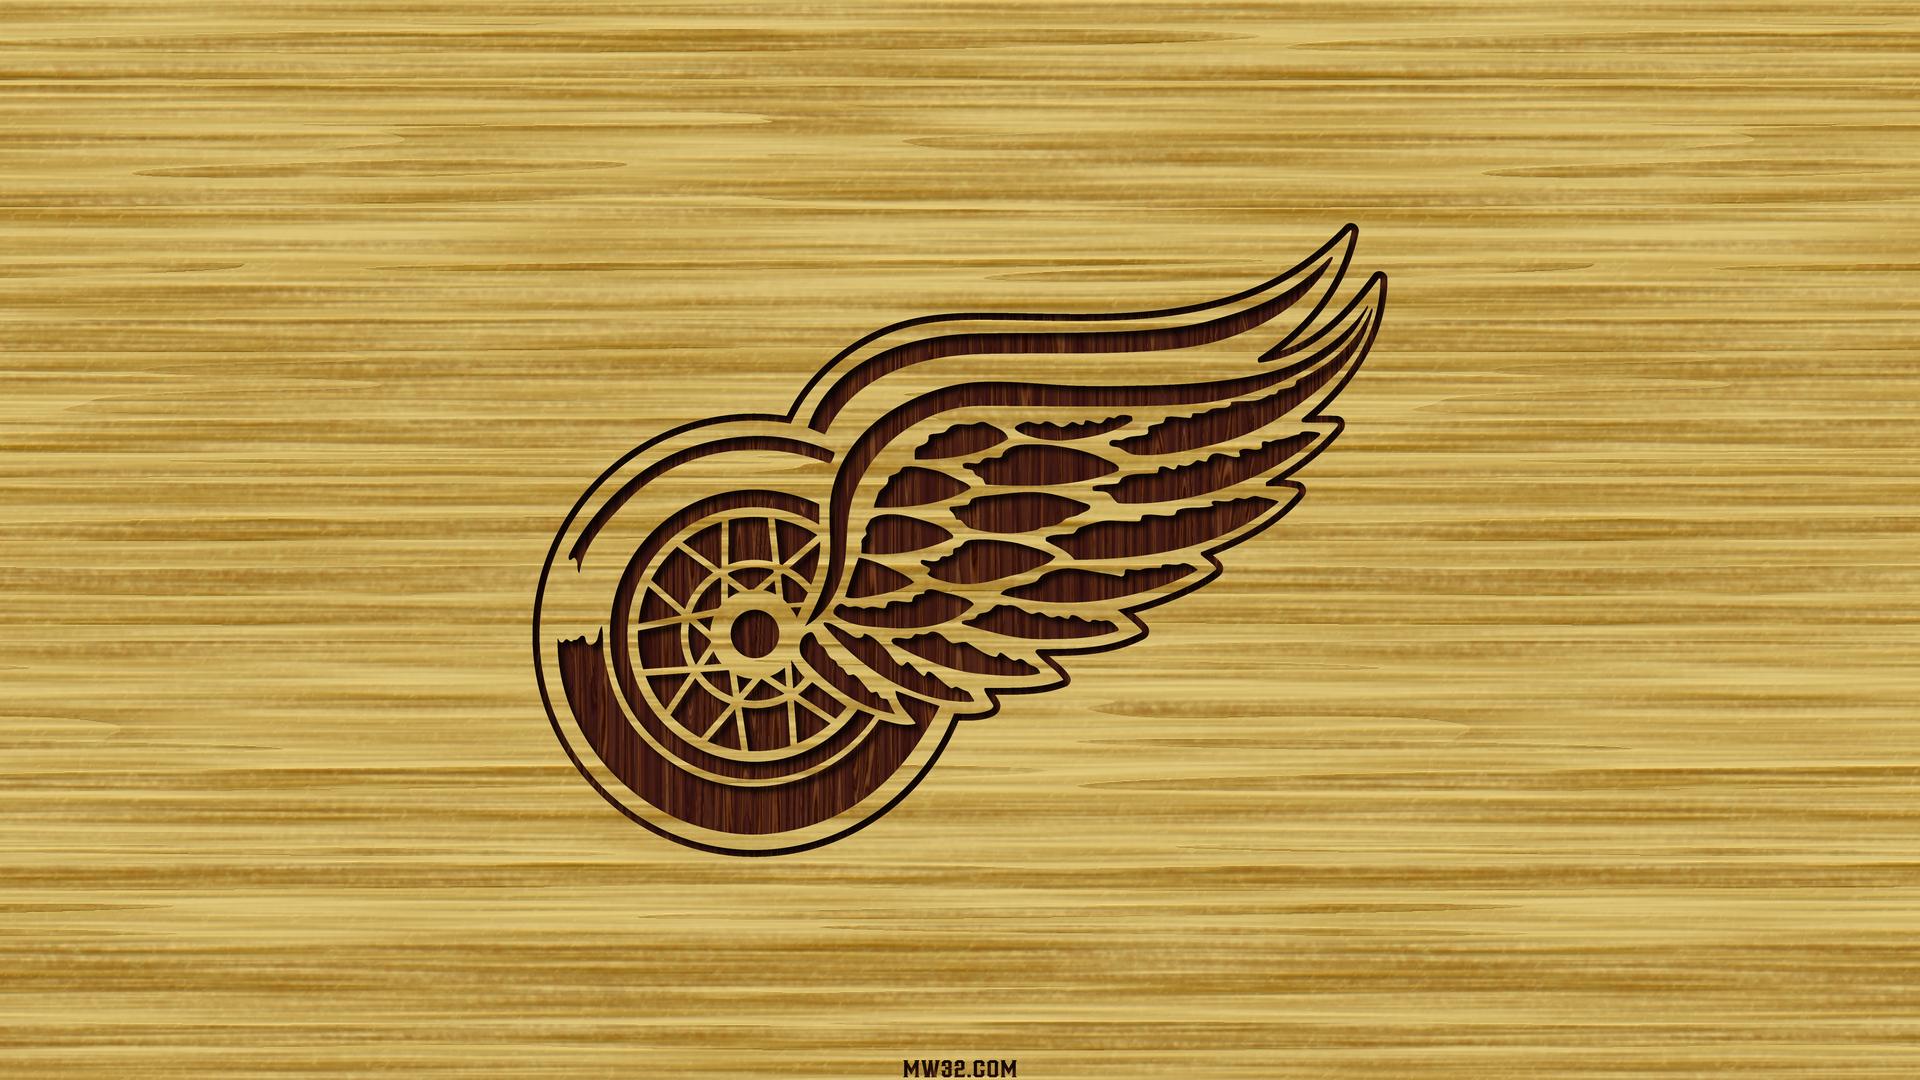 Detroit Red Wings Logo wallpaper   340732 1920x1080